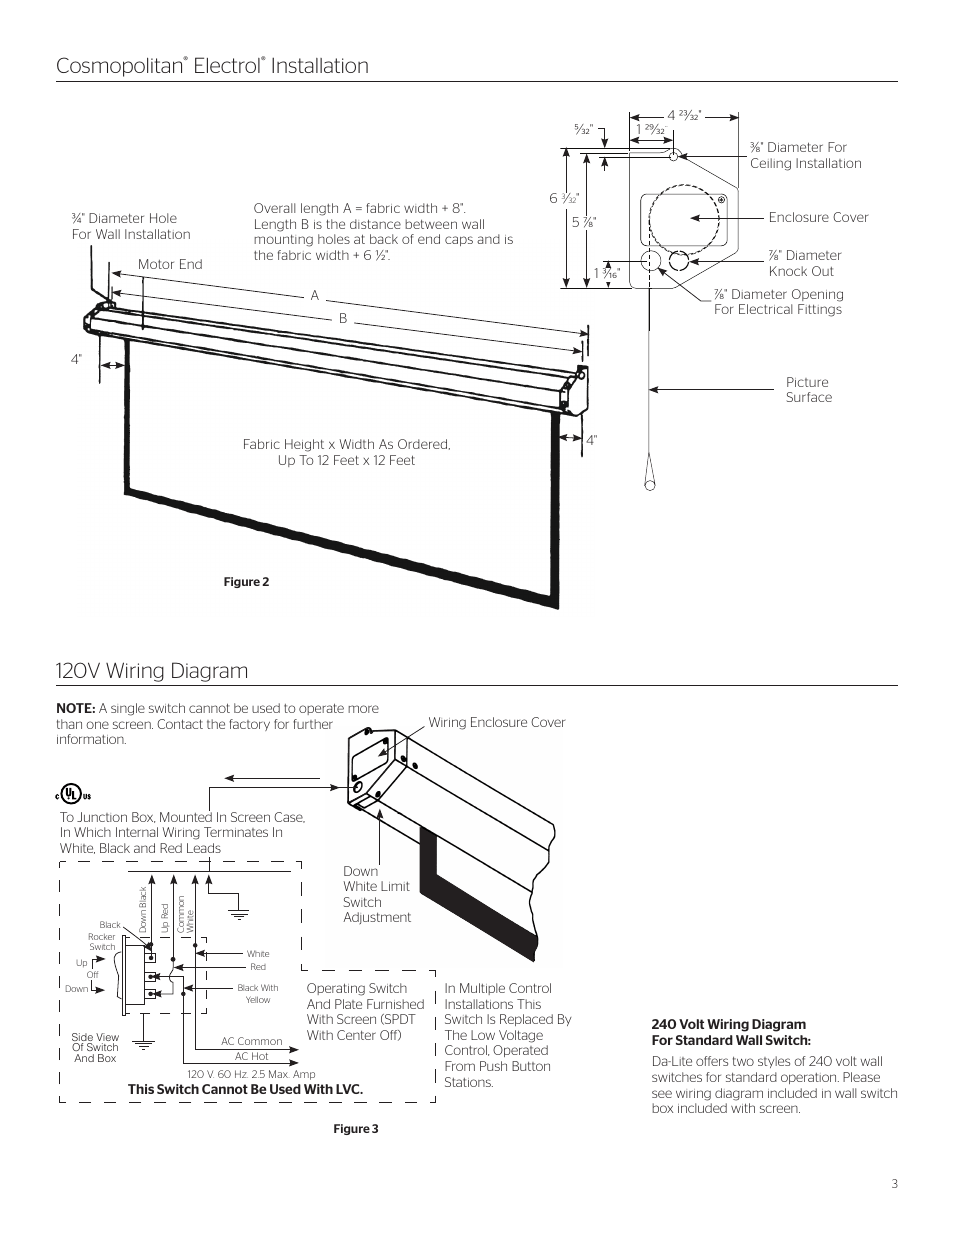 hight resolution of cosmopolitan electrol installation 120v wiring diagram da lite cosmopolitan electrol user manual page 3 8